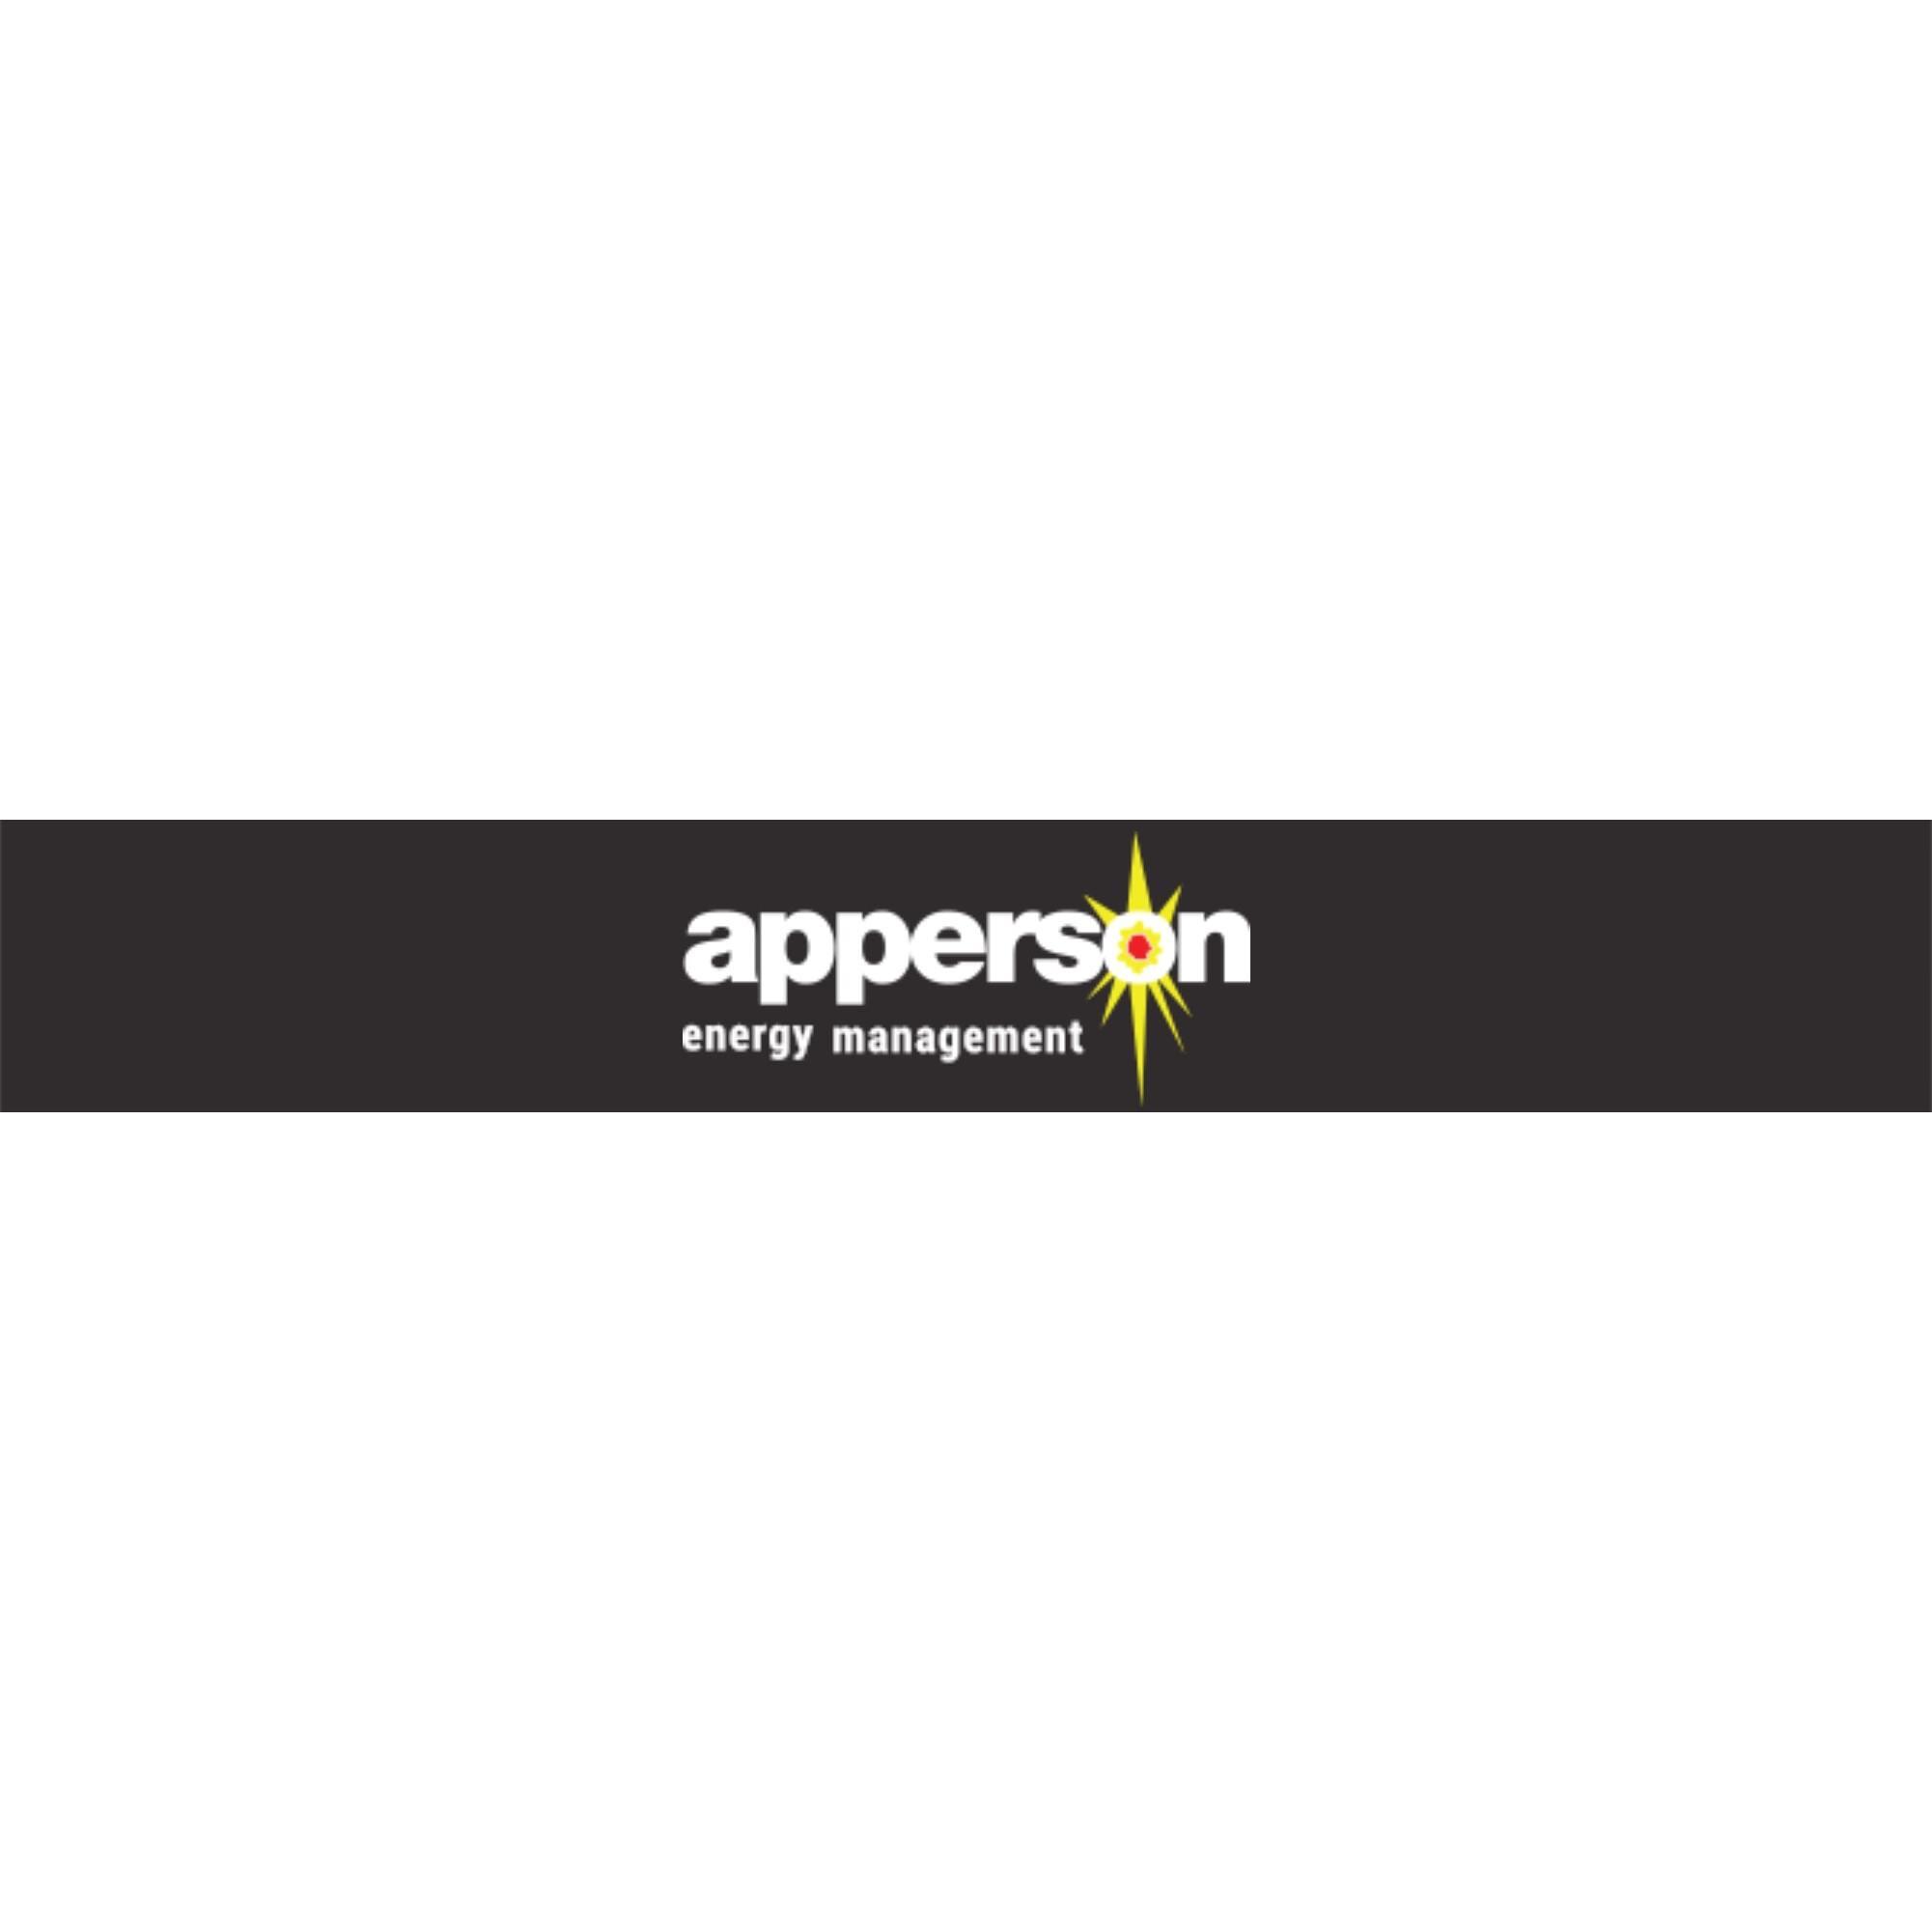 Apperson Energy Management